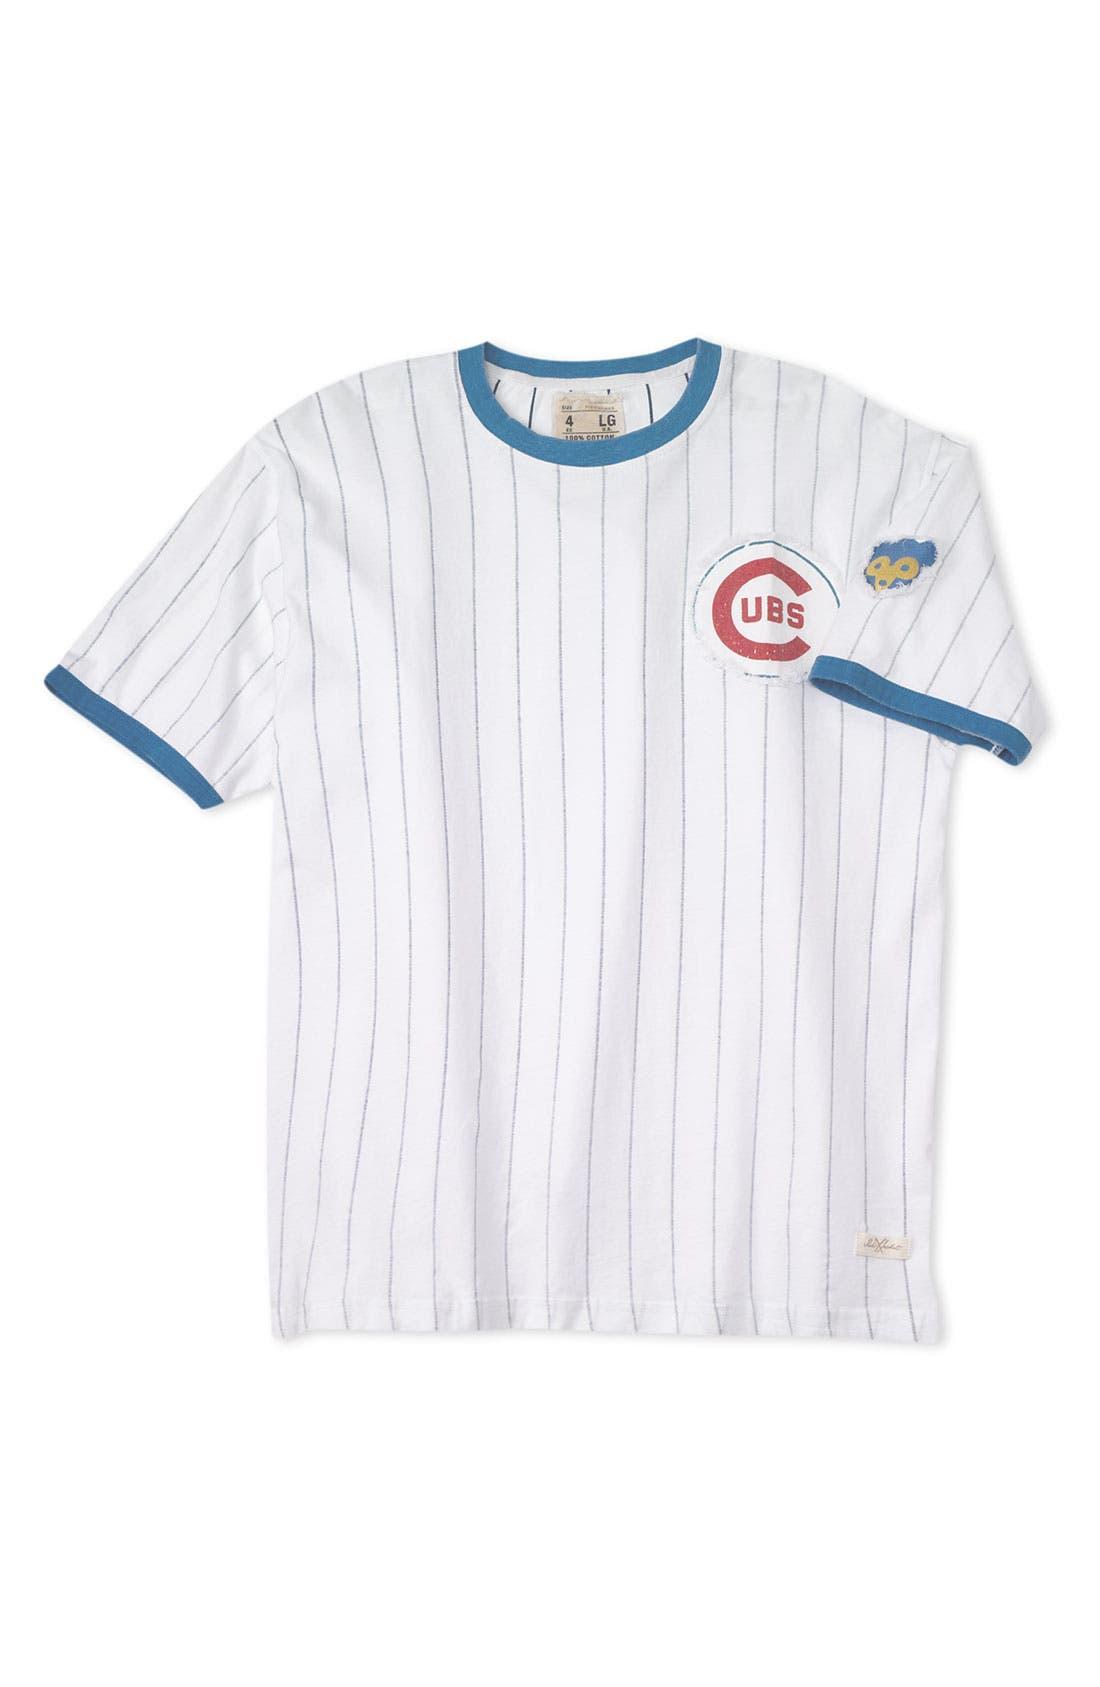 Main Image - Red Jacket 'Chicago Cubs' Crewneck T-Shirt (Men)